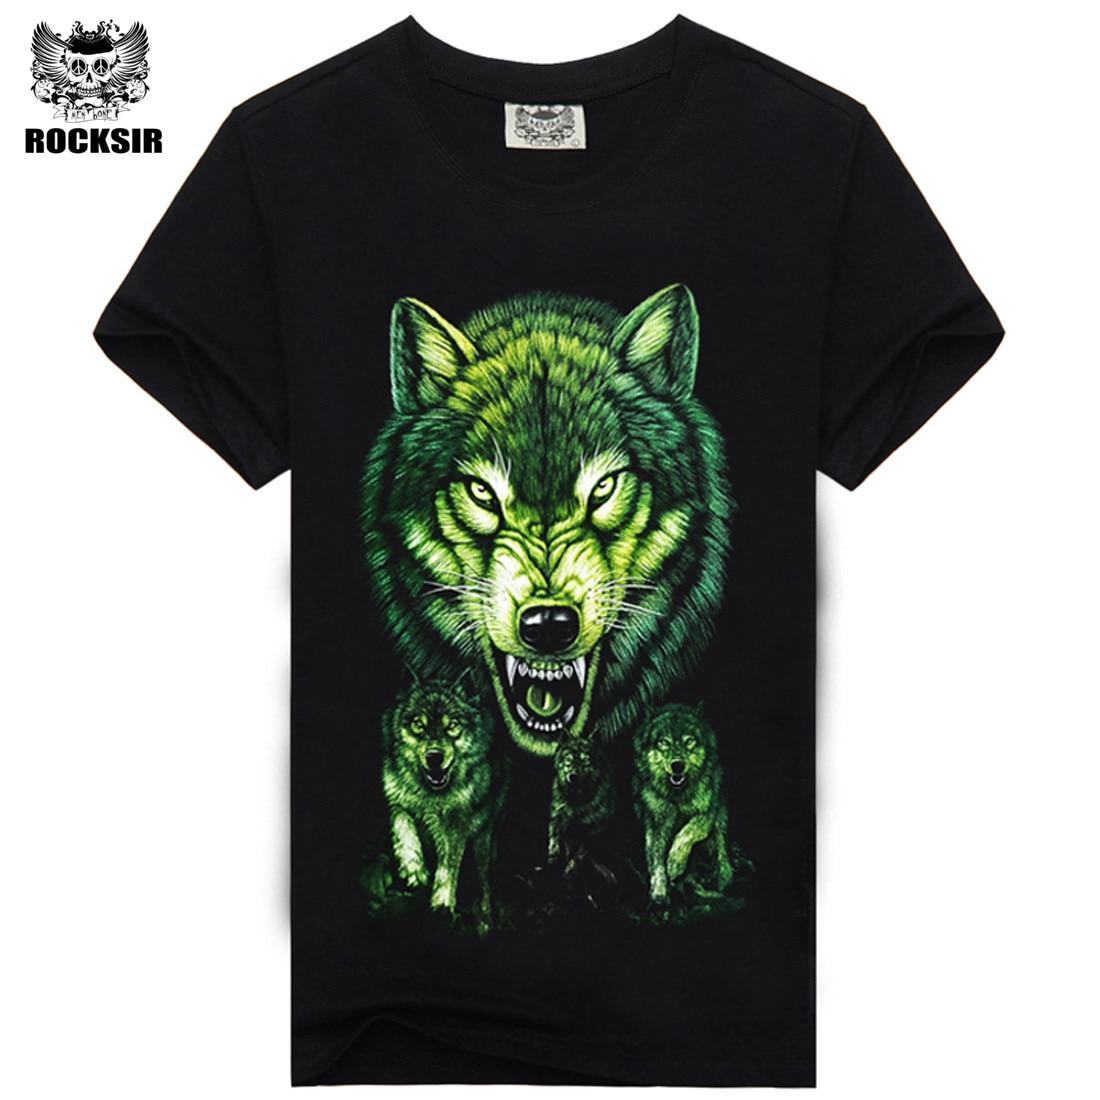 HTB1FQ5USpXXXXcTXVXXq6xXFXXXL - Rocksir 3d wolf t shirt Indians wolf t shirts boyfriend gift ideas